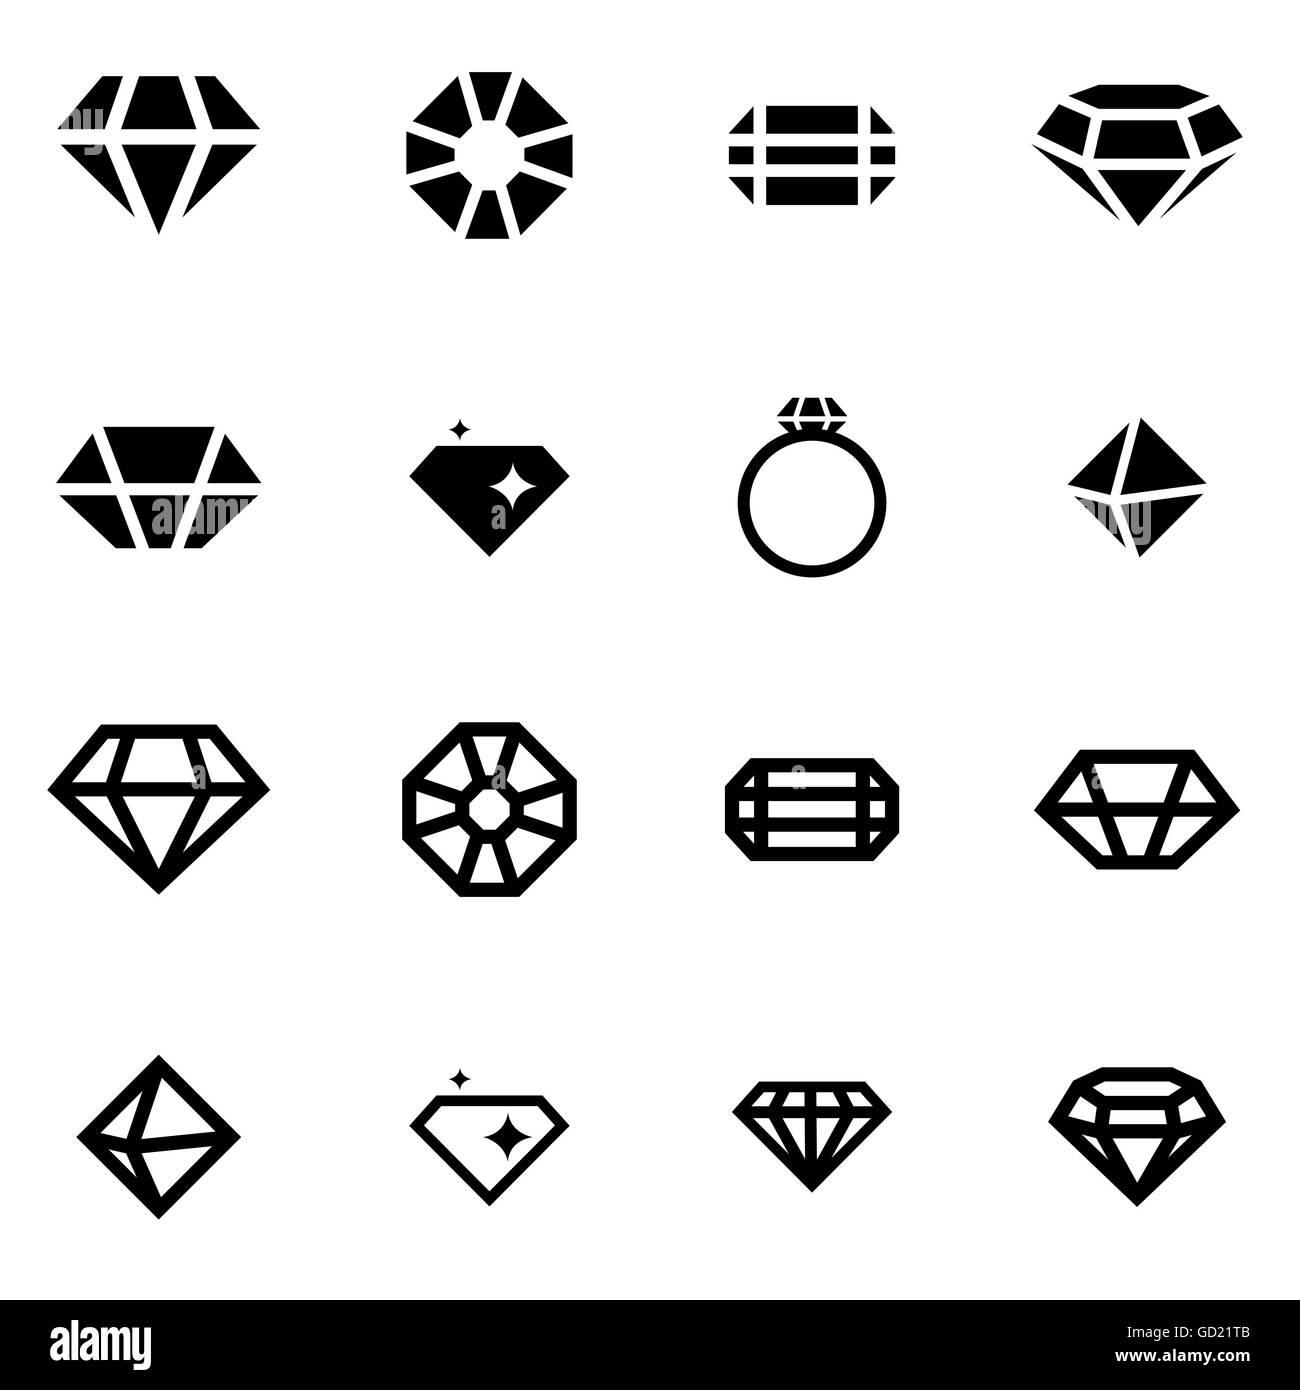 Vector black diamond icon set - Stock Image